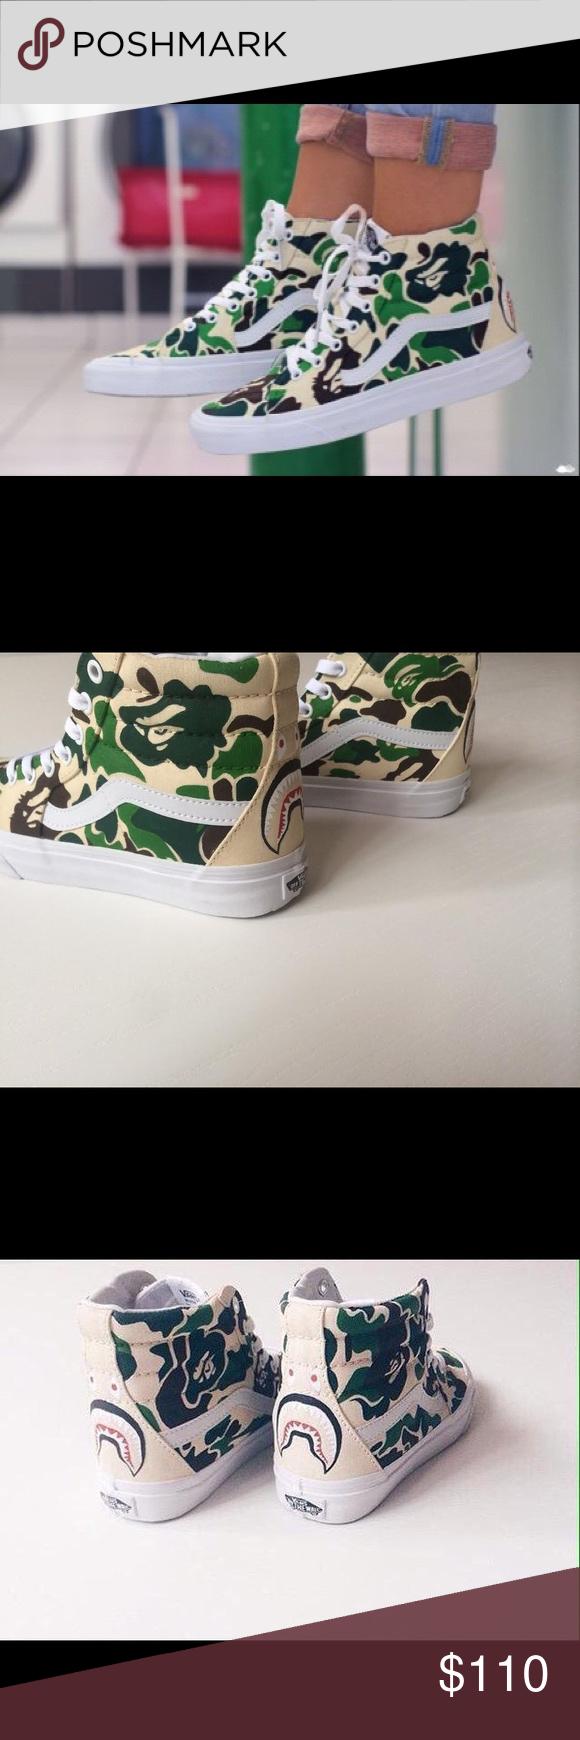 BAPE X Vans Sk8 Hi Sneakers